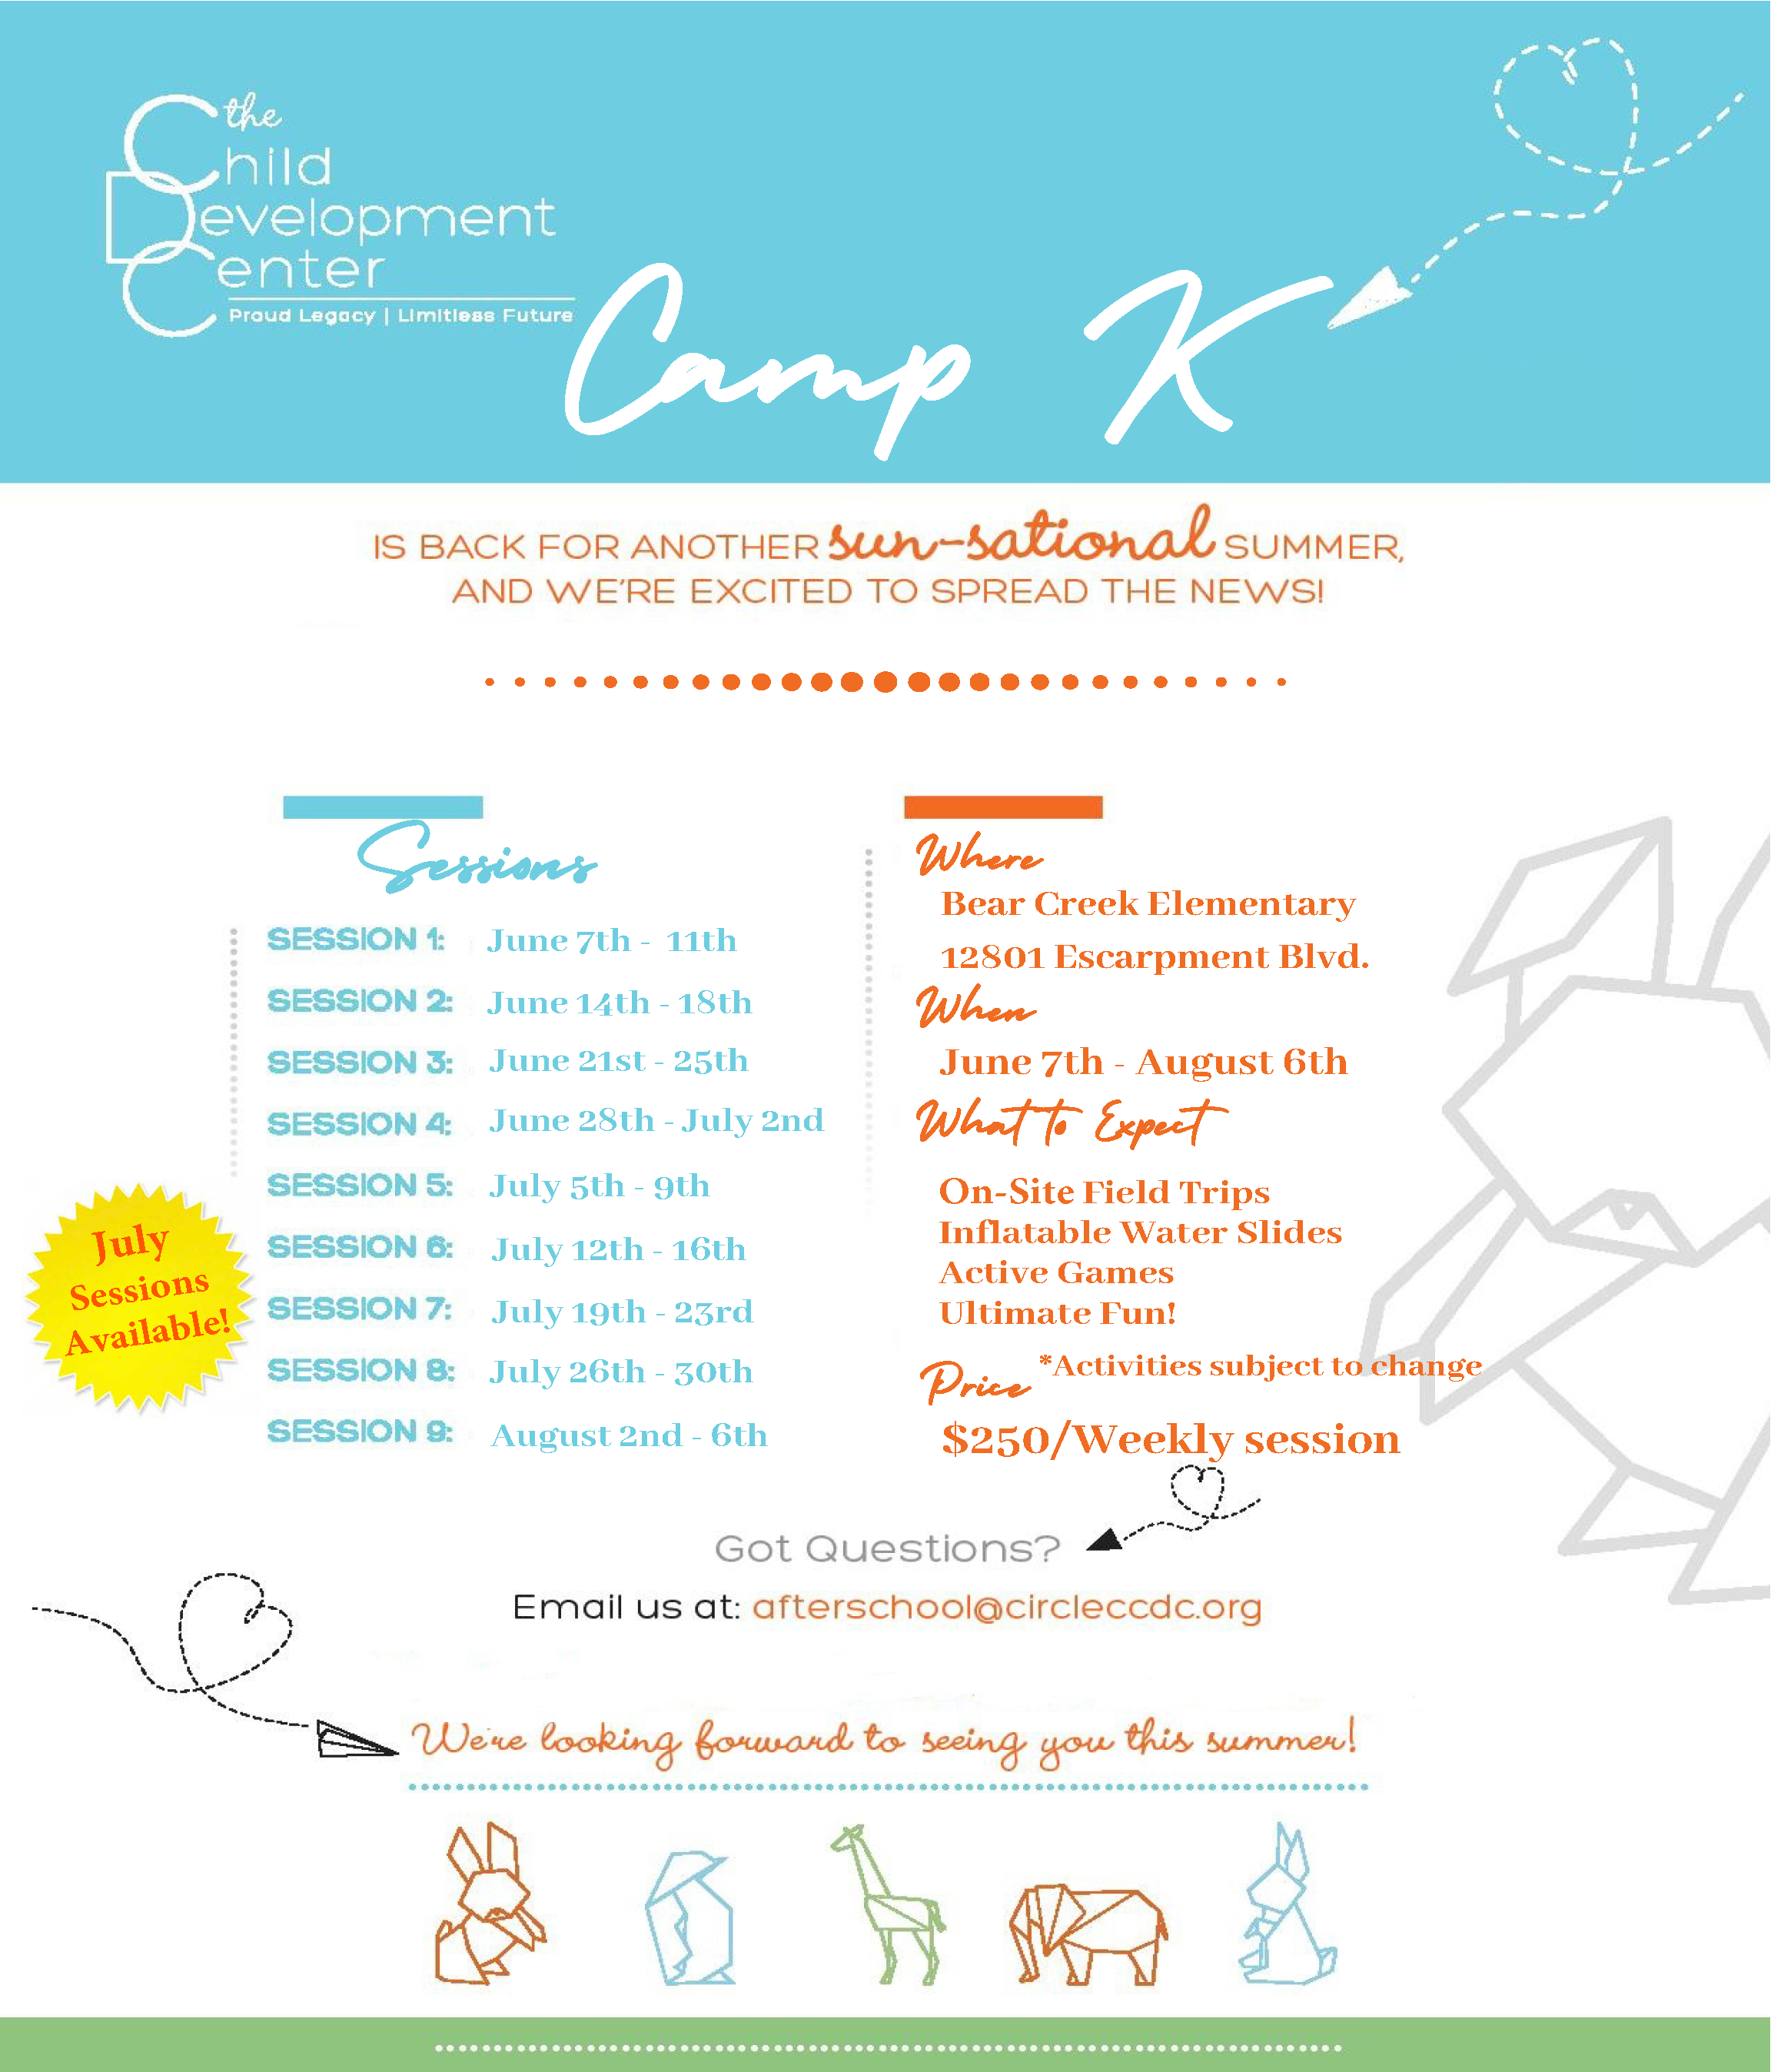 Camp K Flyer updated 4-27